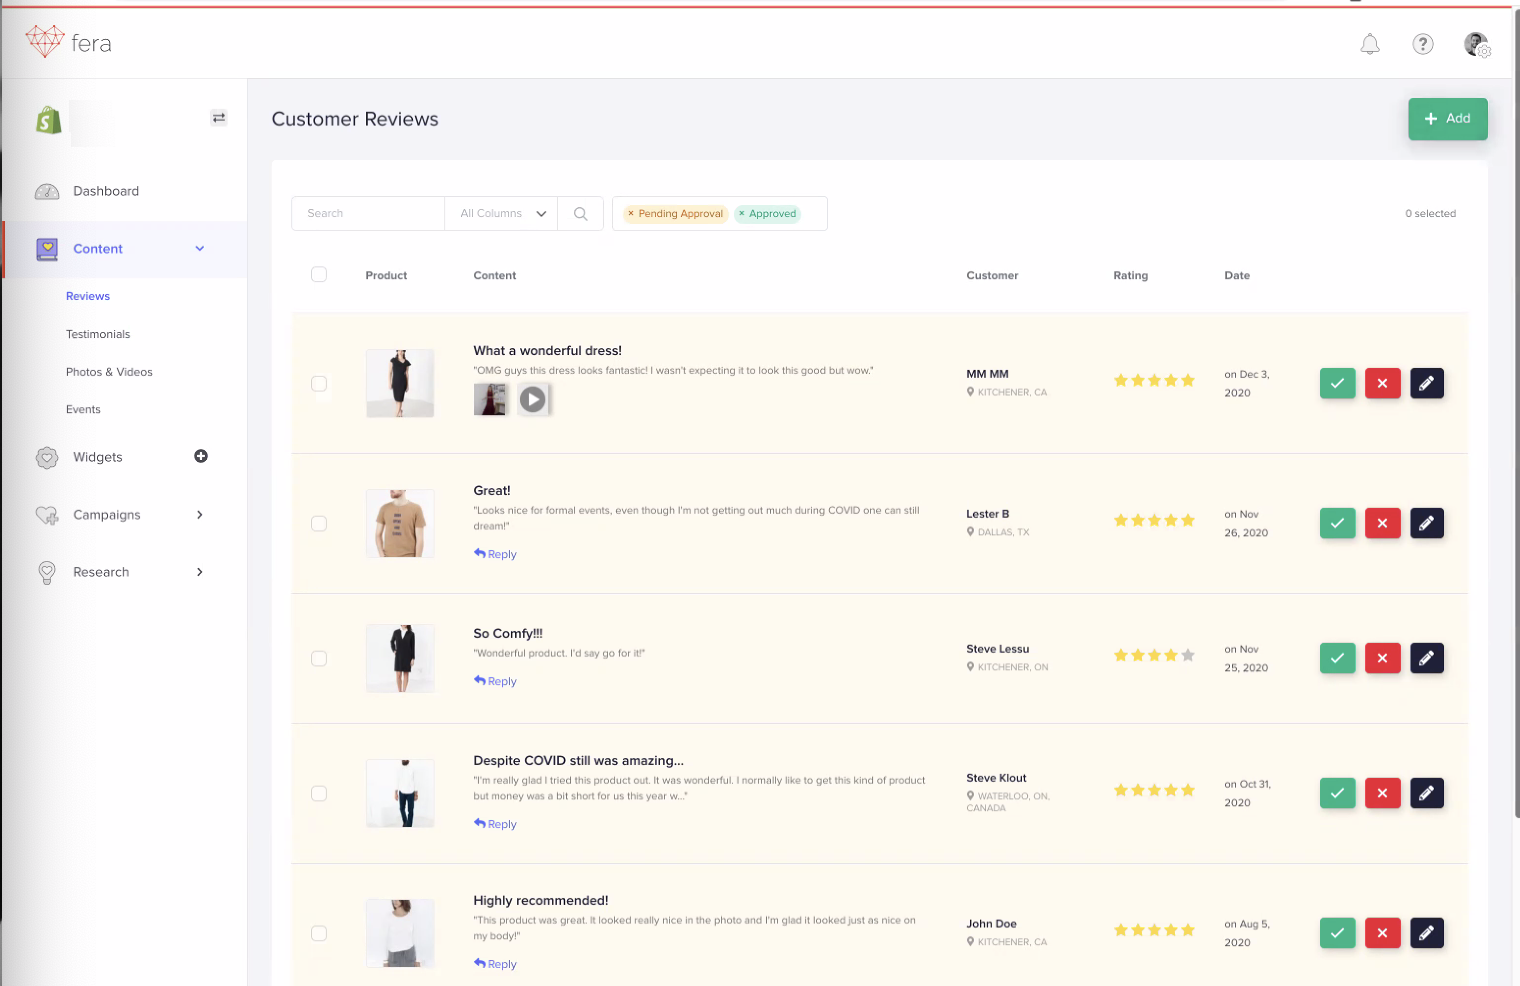 Fera_Customer Reviews